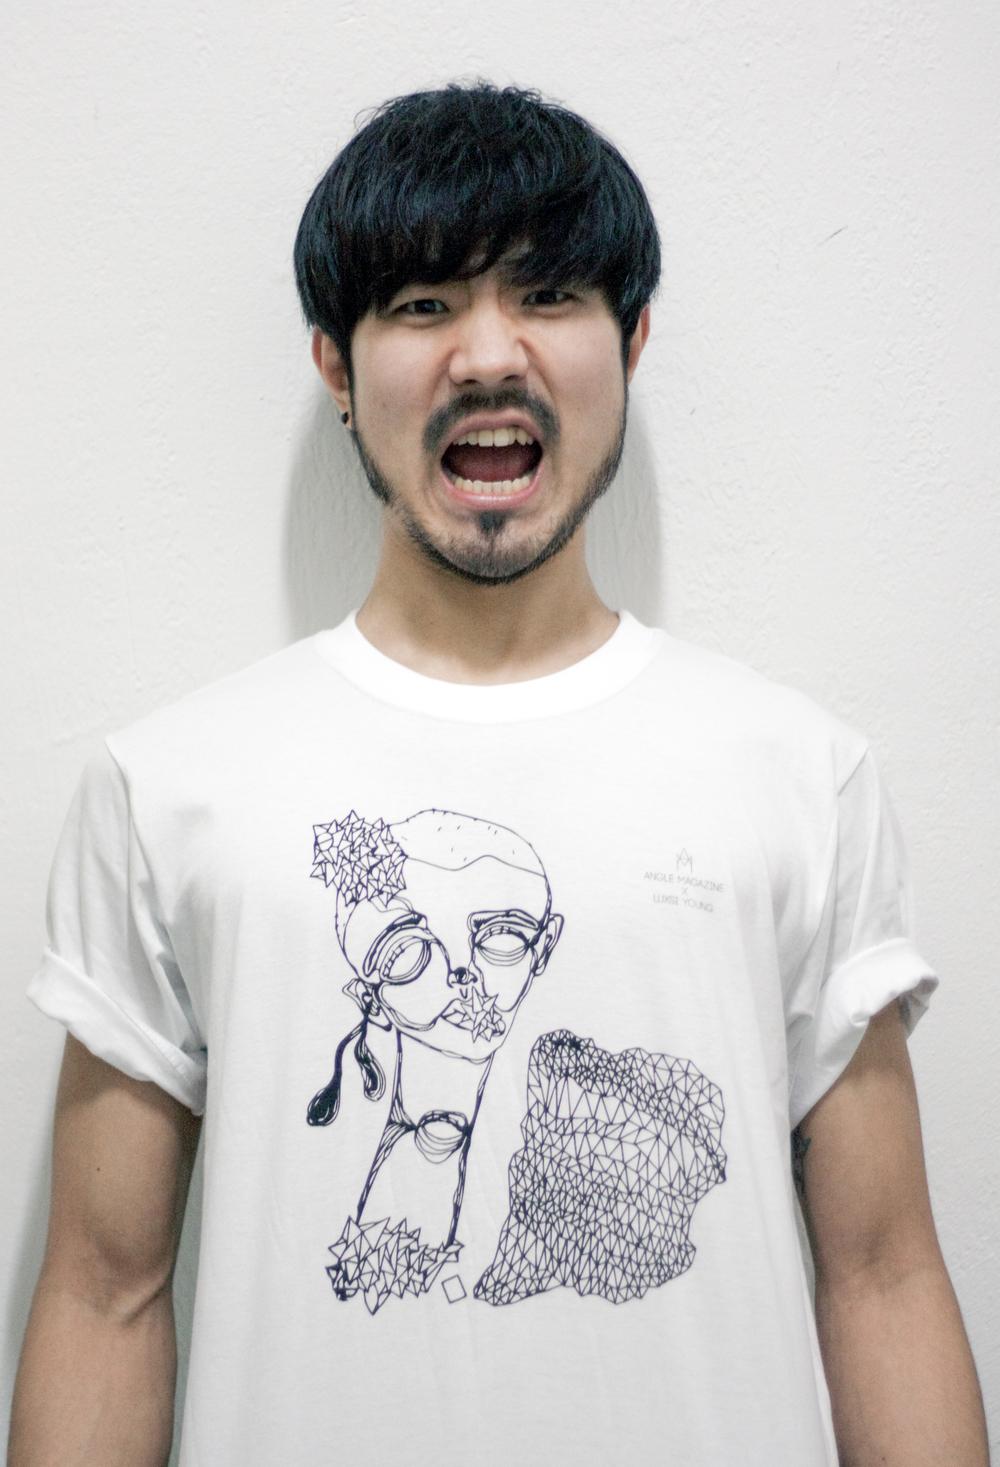 Model:윤준홍 of 57